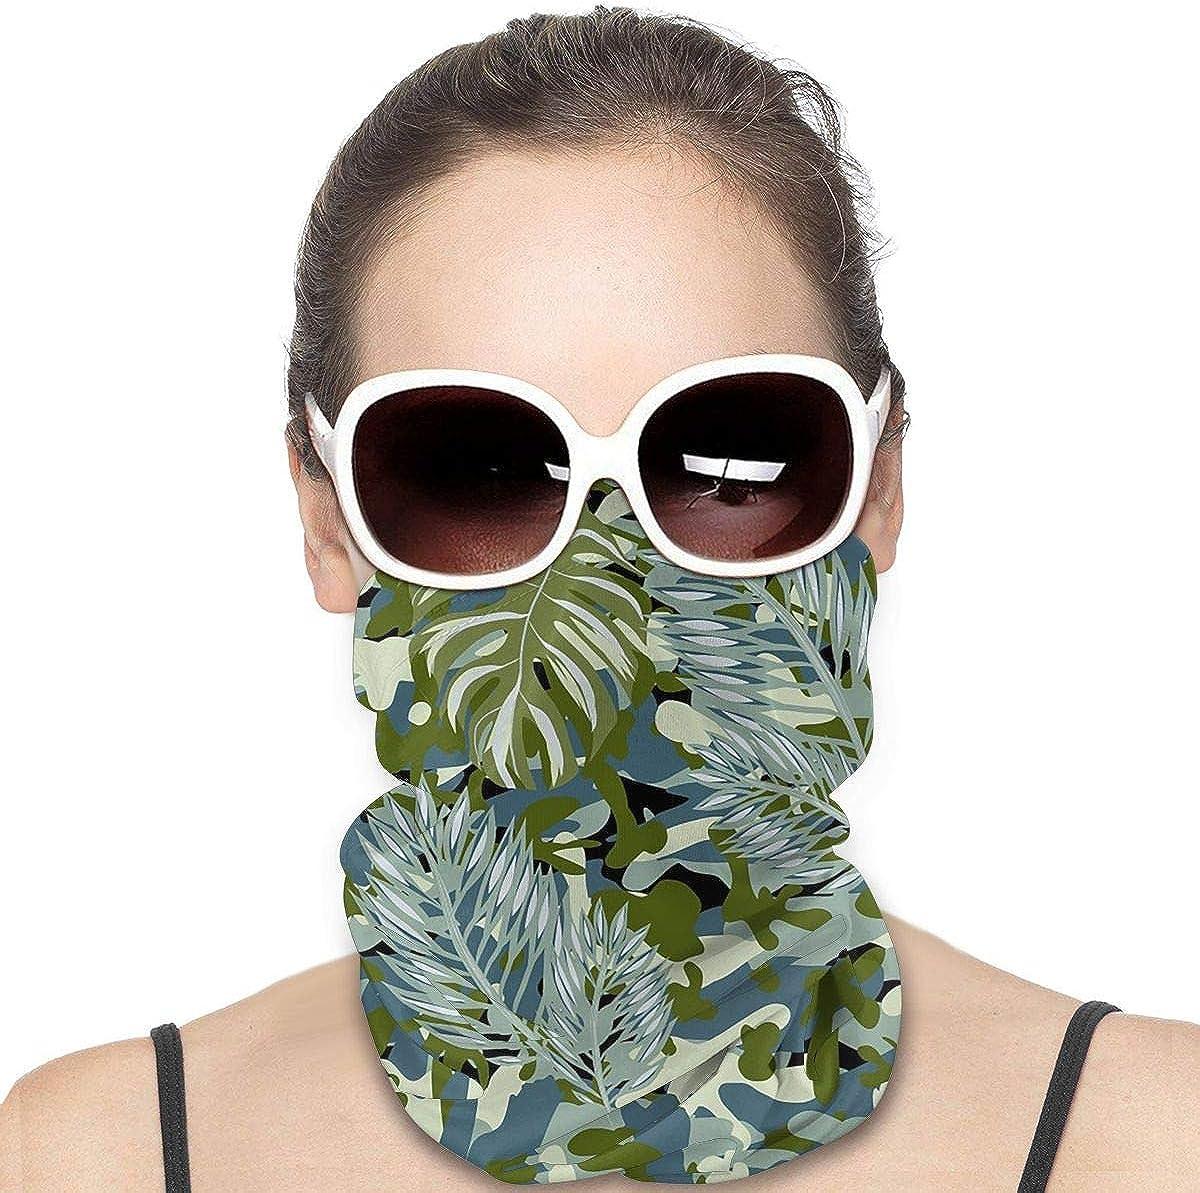 KiuLoam Women Bandanas Face Mask, Military Green Camouflage Palm Leaf Neck Gaiter Mask Headband for Men Face Scarf Dust, Outdoors, Sports